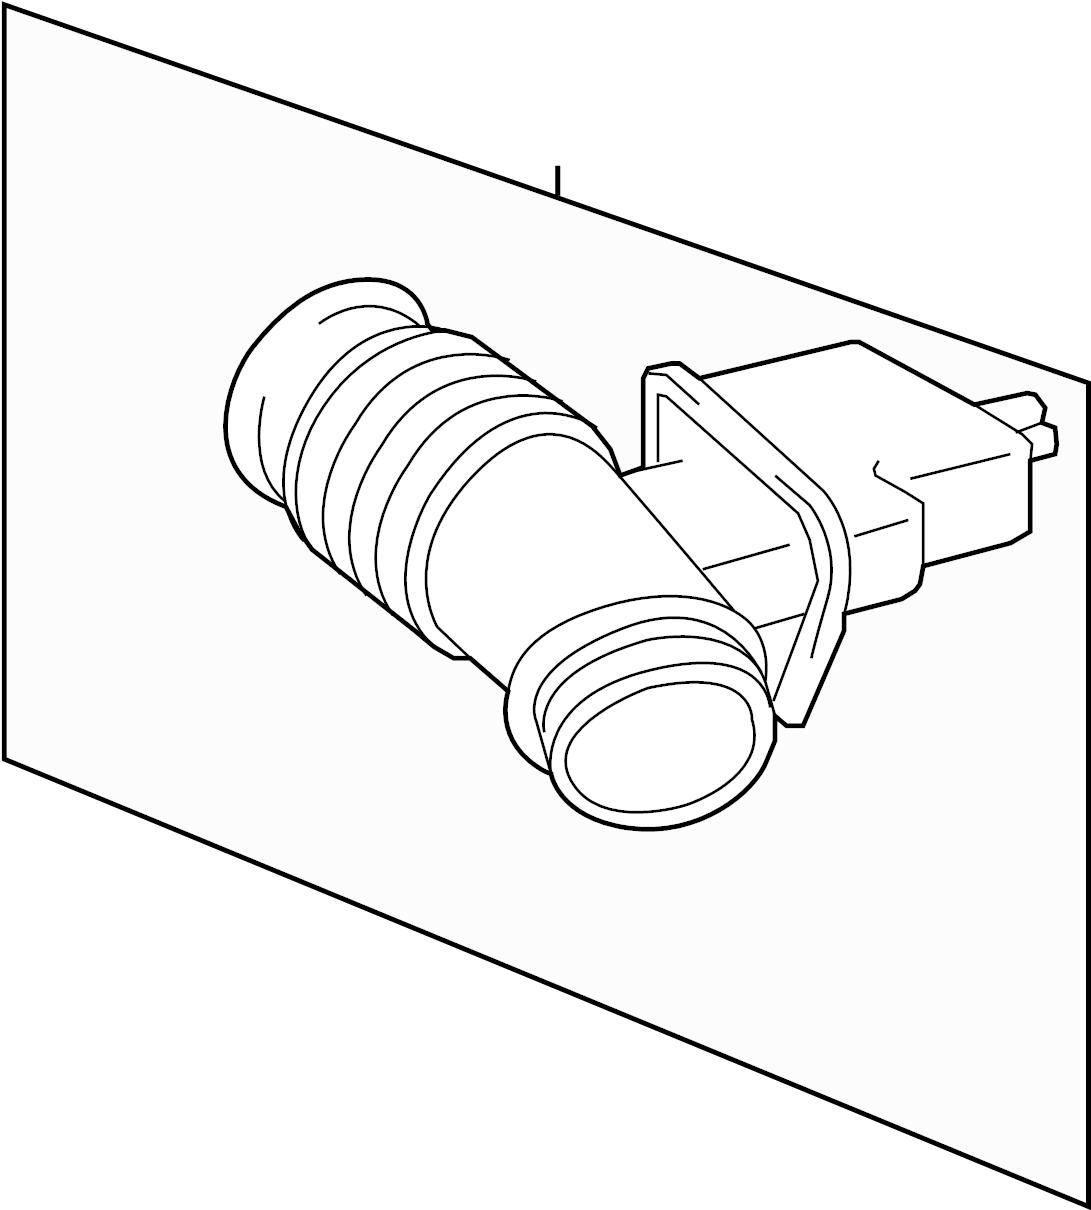 Toyota Tundra Engine Air Intake Resonator. 4.6 LITER. 5.7